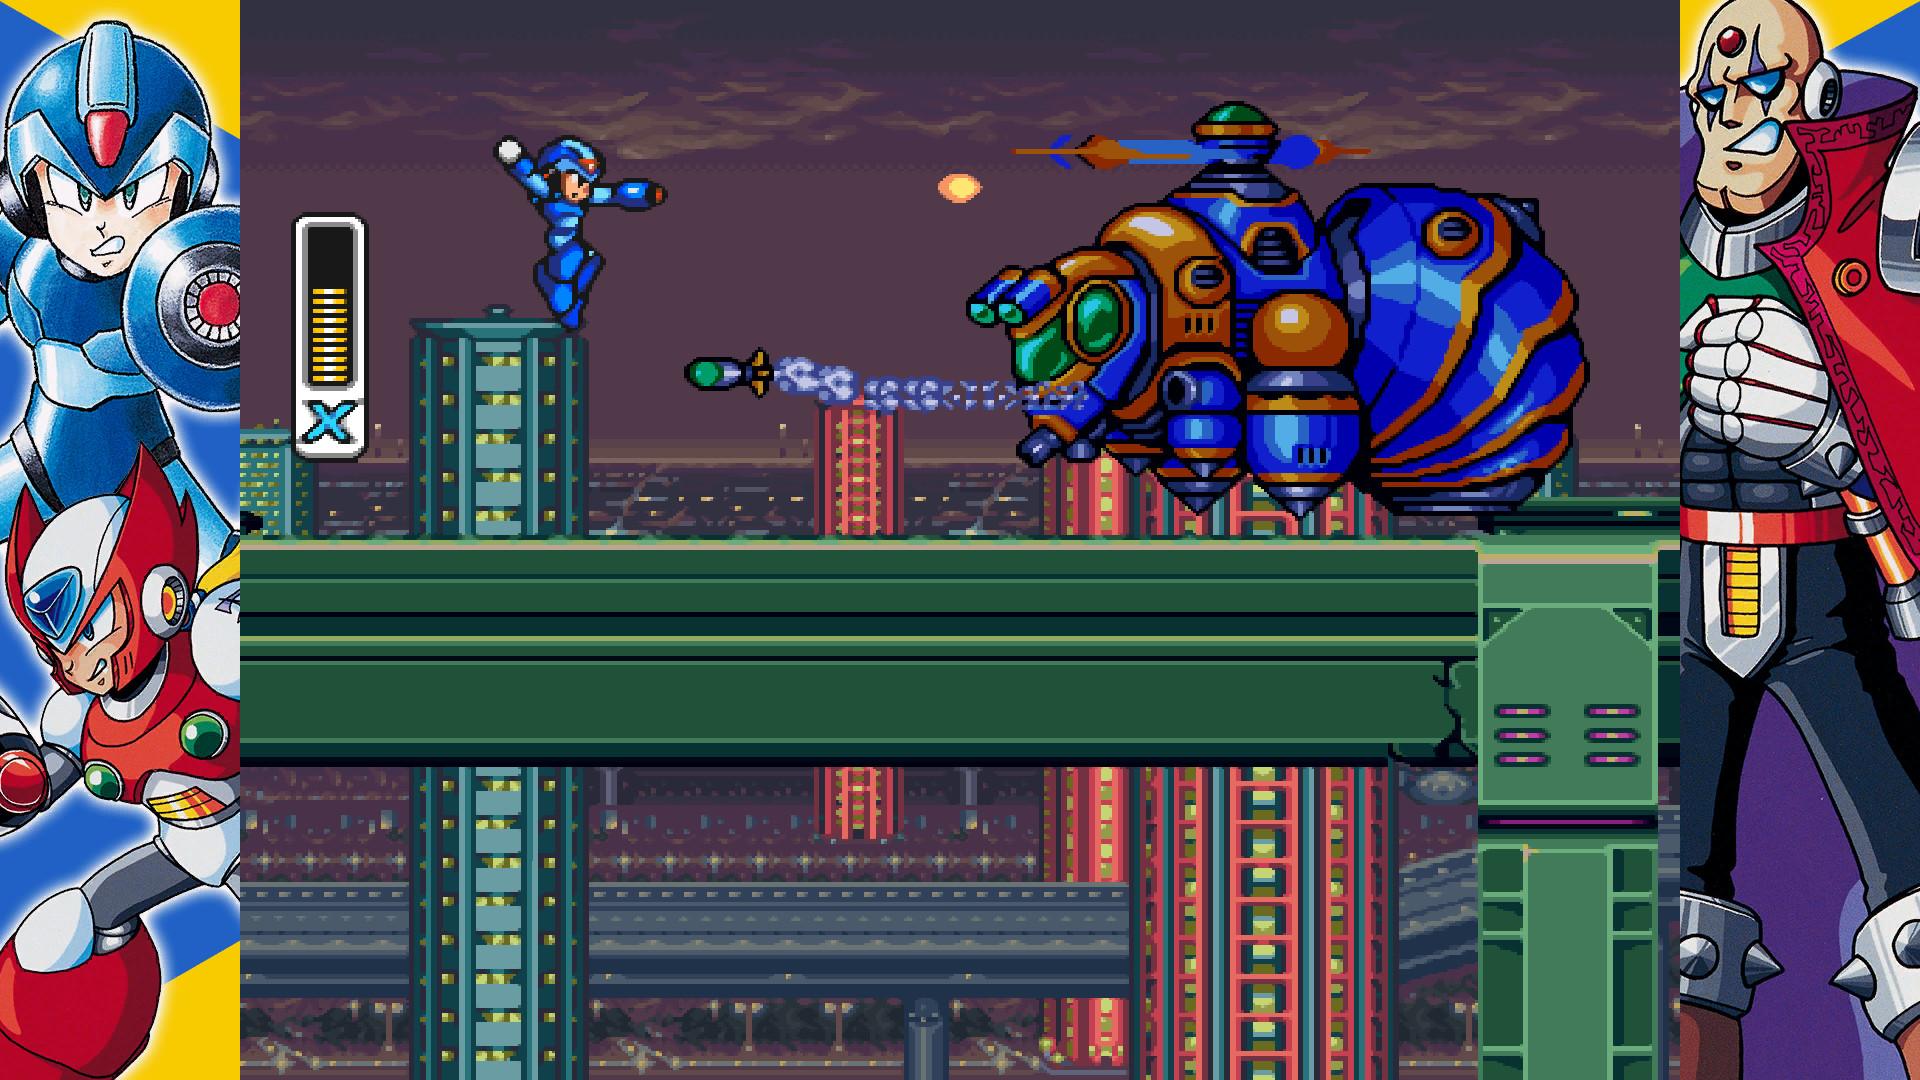 Mega Man X Legacy Collection / ロックマンX アニバーサリー コレクション